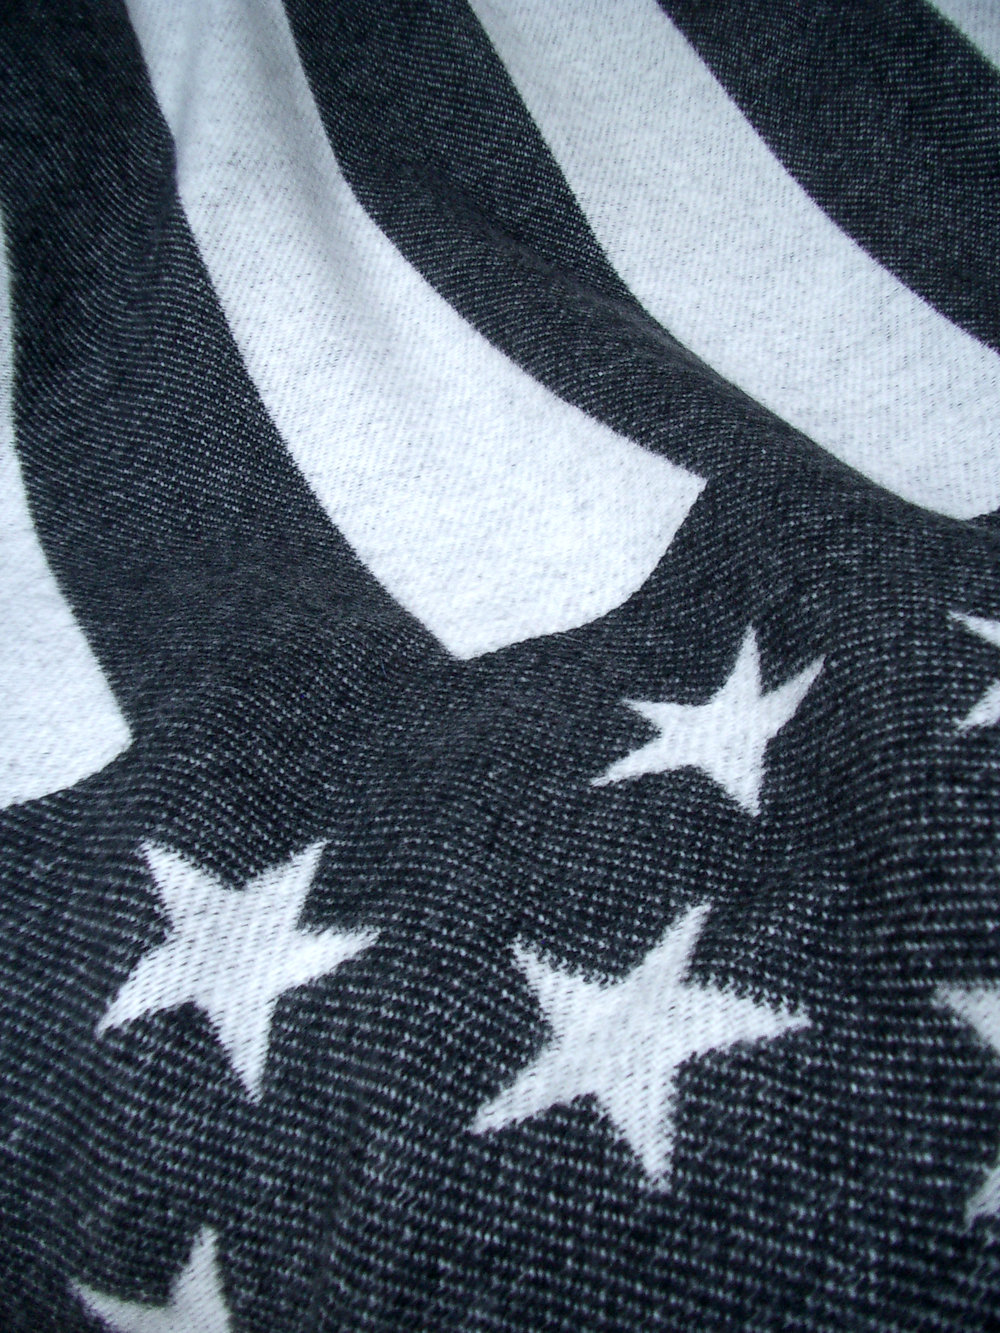 Stars + Stripes 7 .jpg